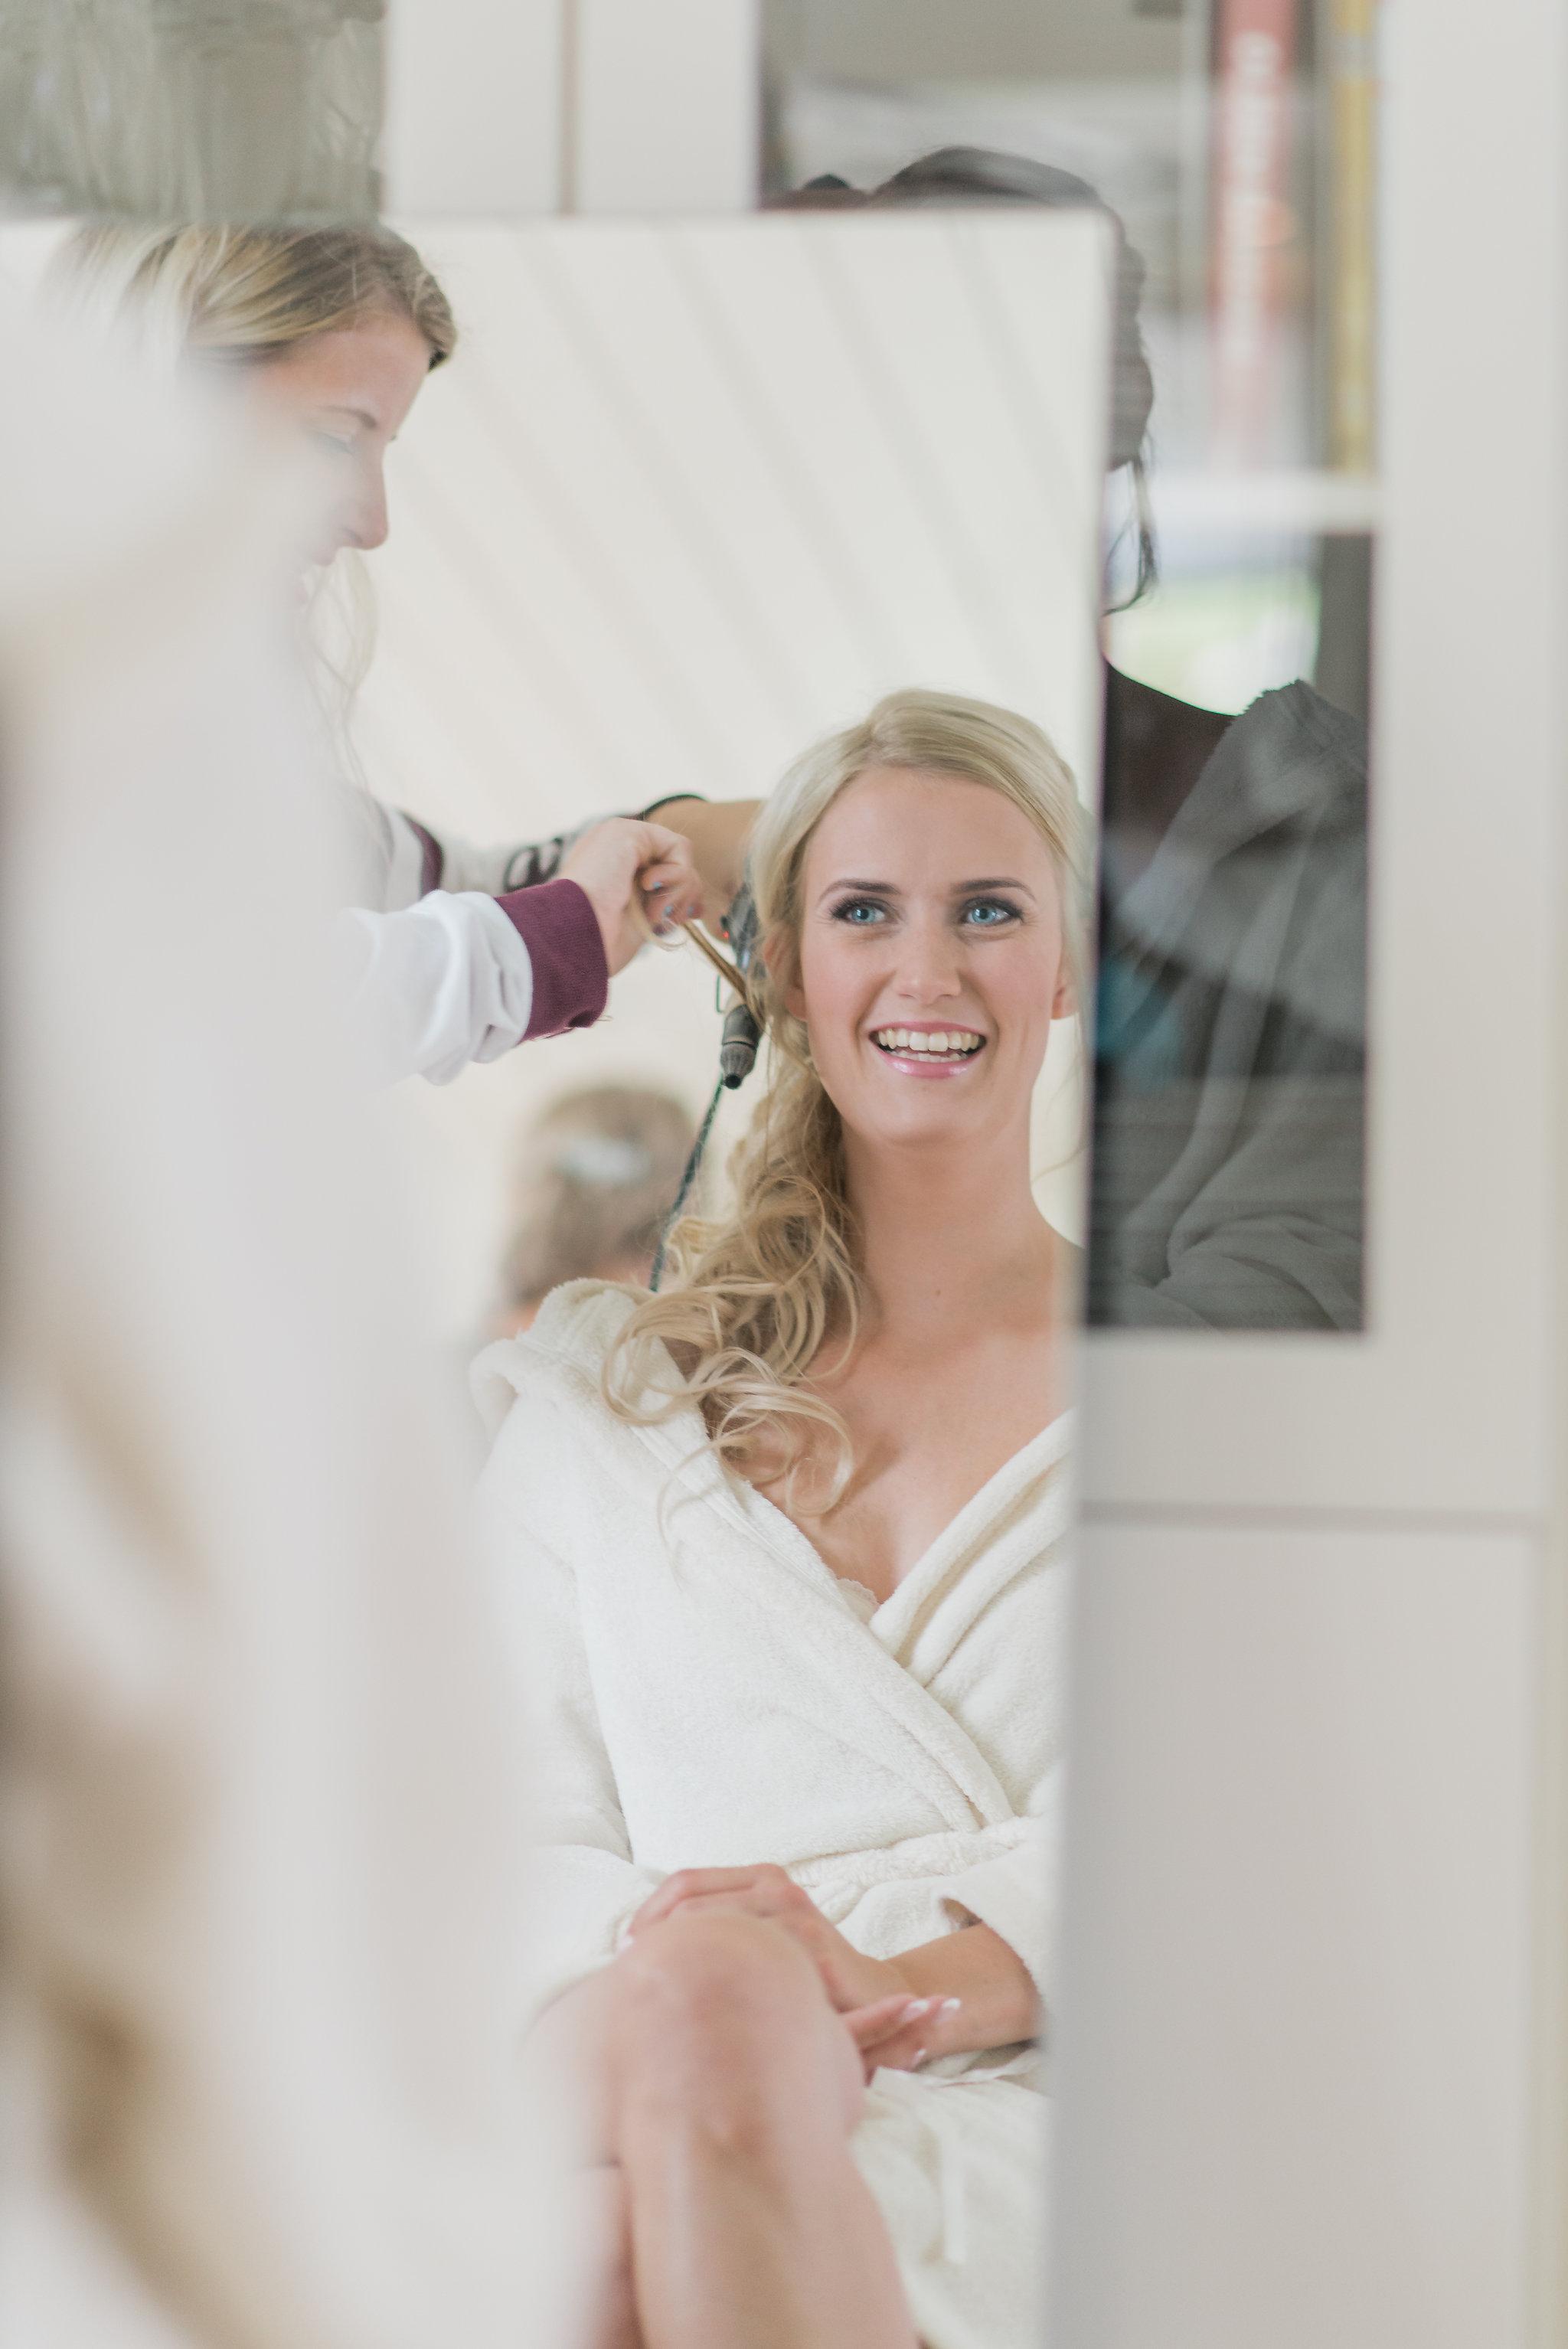 _6007361-2fotograf-bryllup-tyrifjorden.jpg